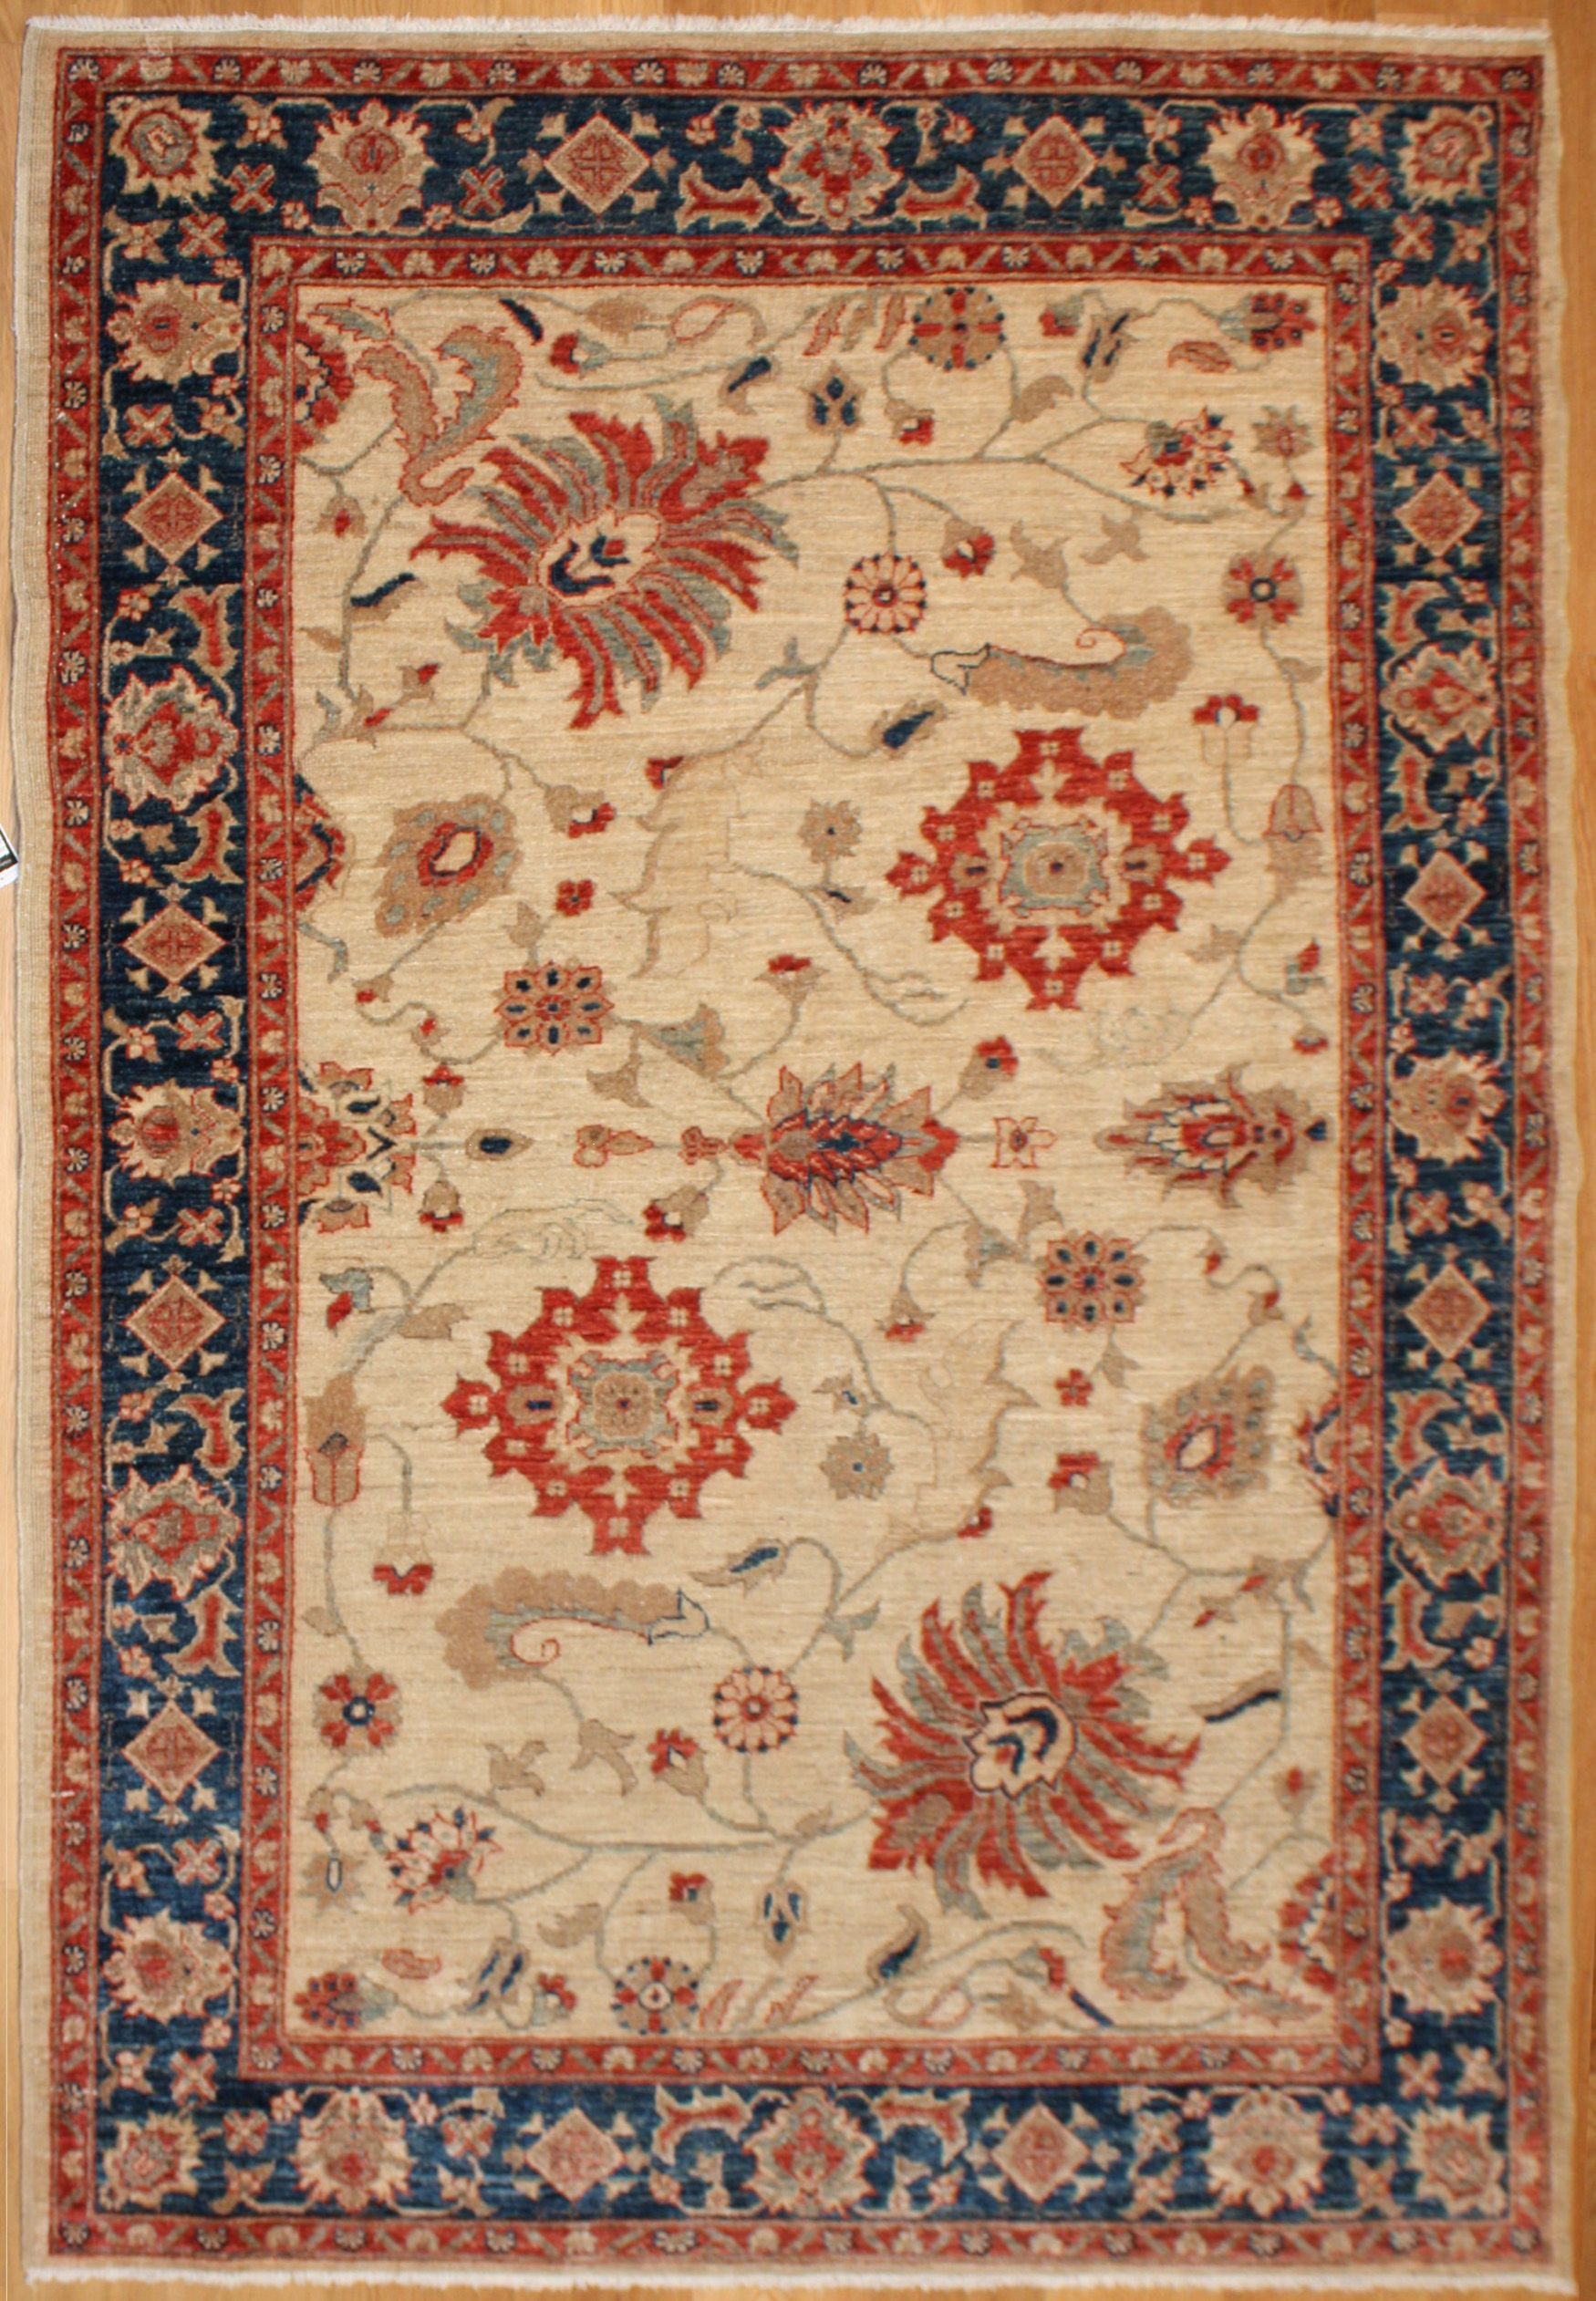 Ziegler Carpet for Sale | Buy Ziegler Carpet Online | Afghan Carpet Buy Online